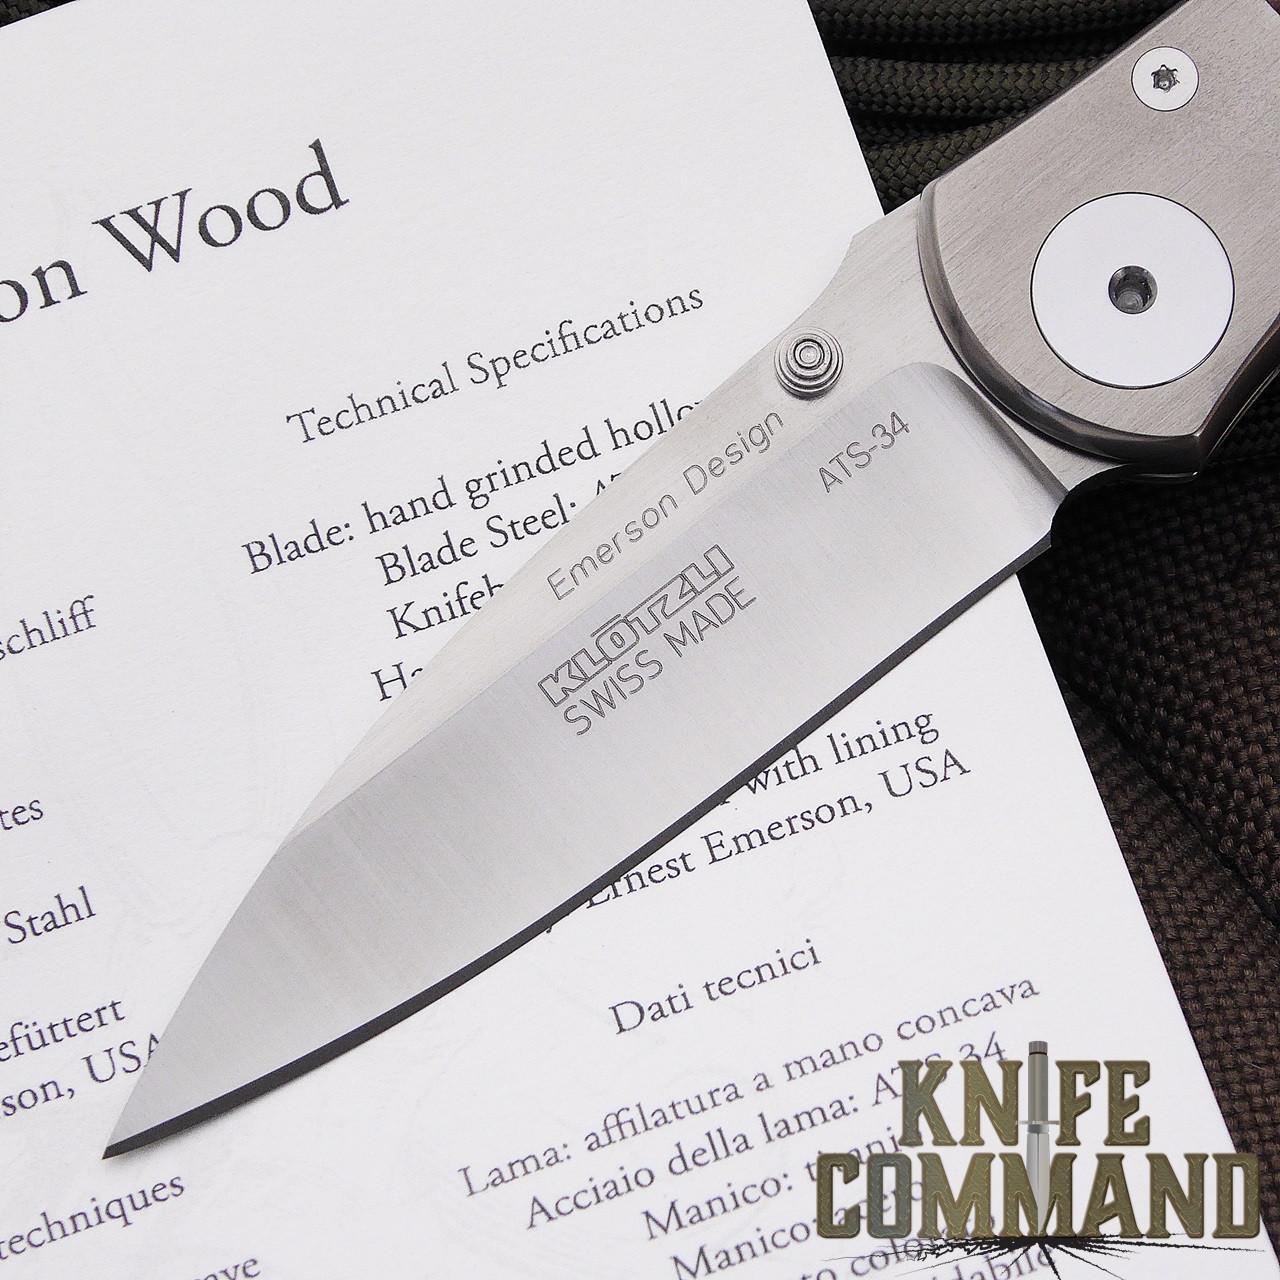 Klotzli Knives Ernest Emerson Titanium Maple Folding Knife.  ATS-34 drop point blade.